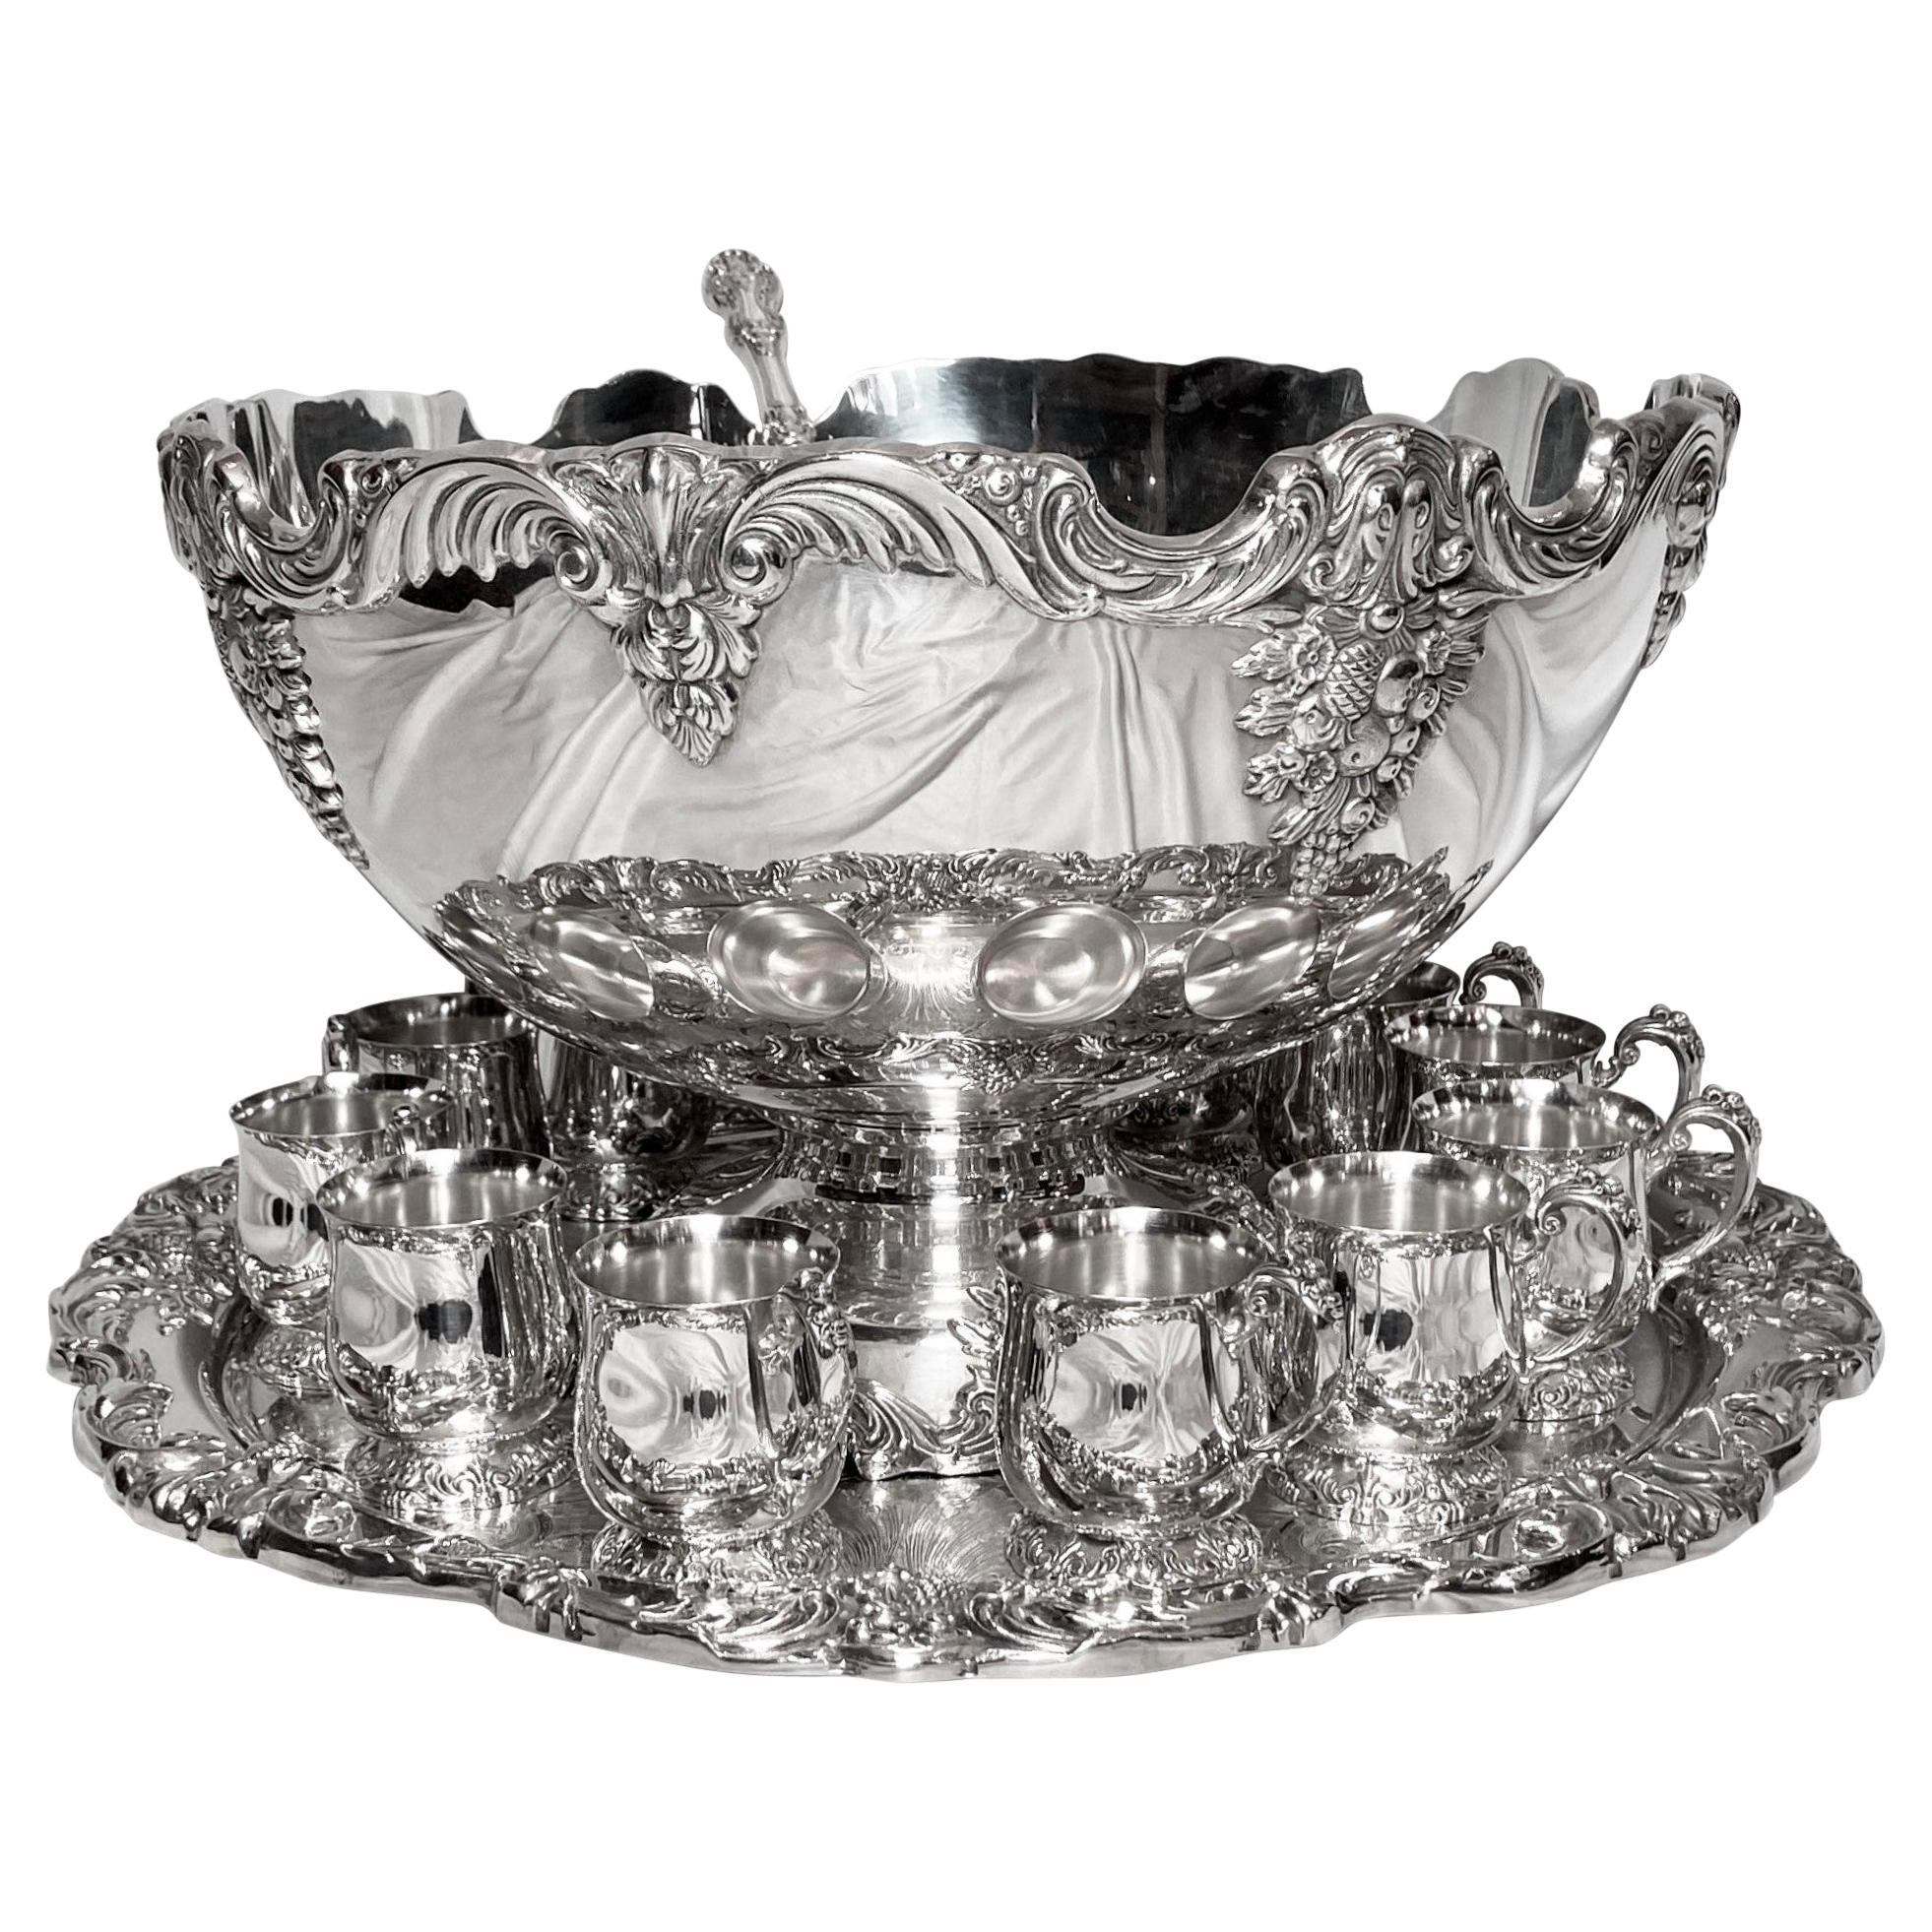 Estate American Reed & Barton 15 Piece Silver Punch Bowl Service, Circa 1950's